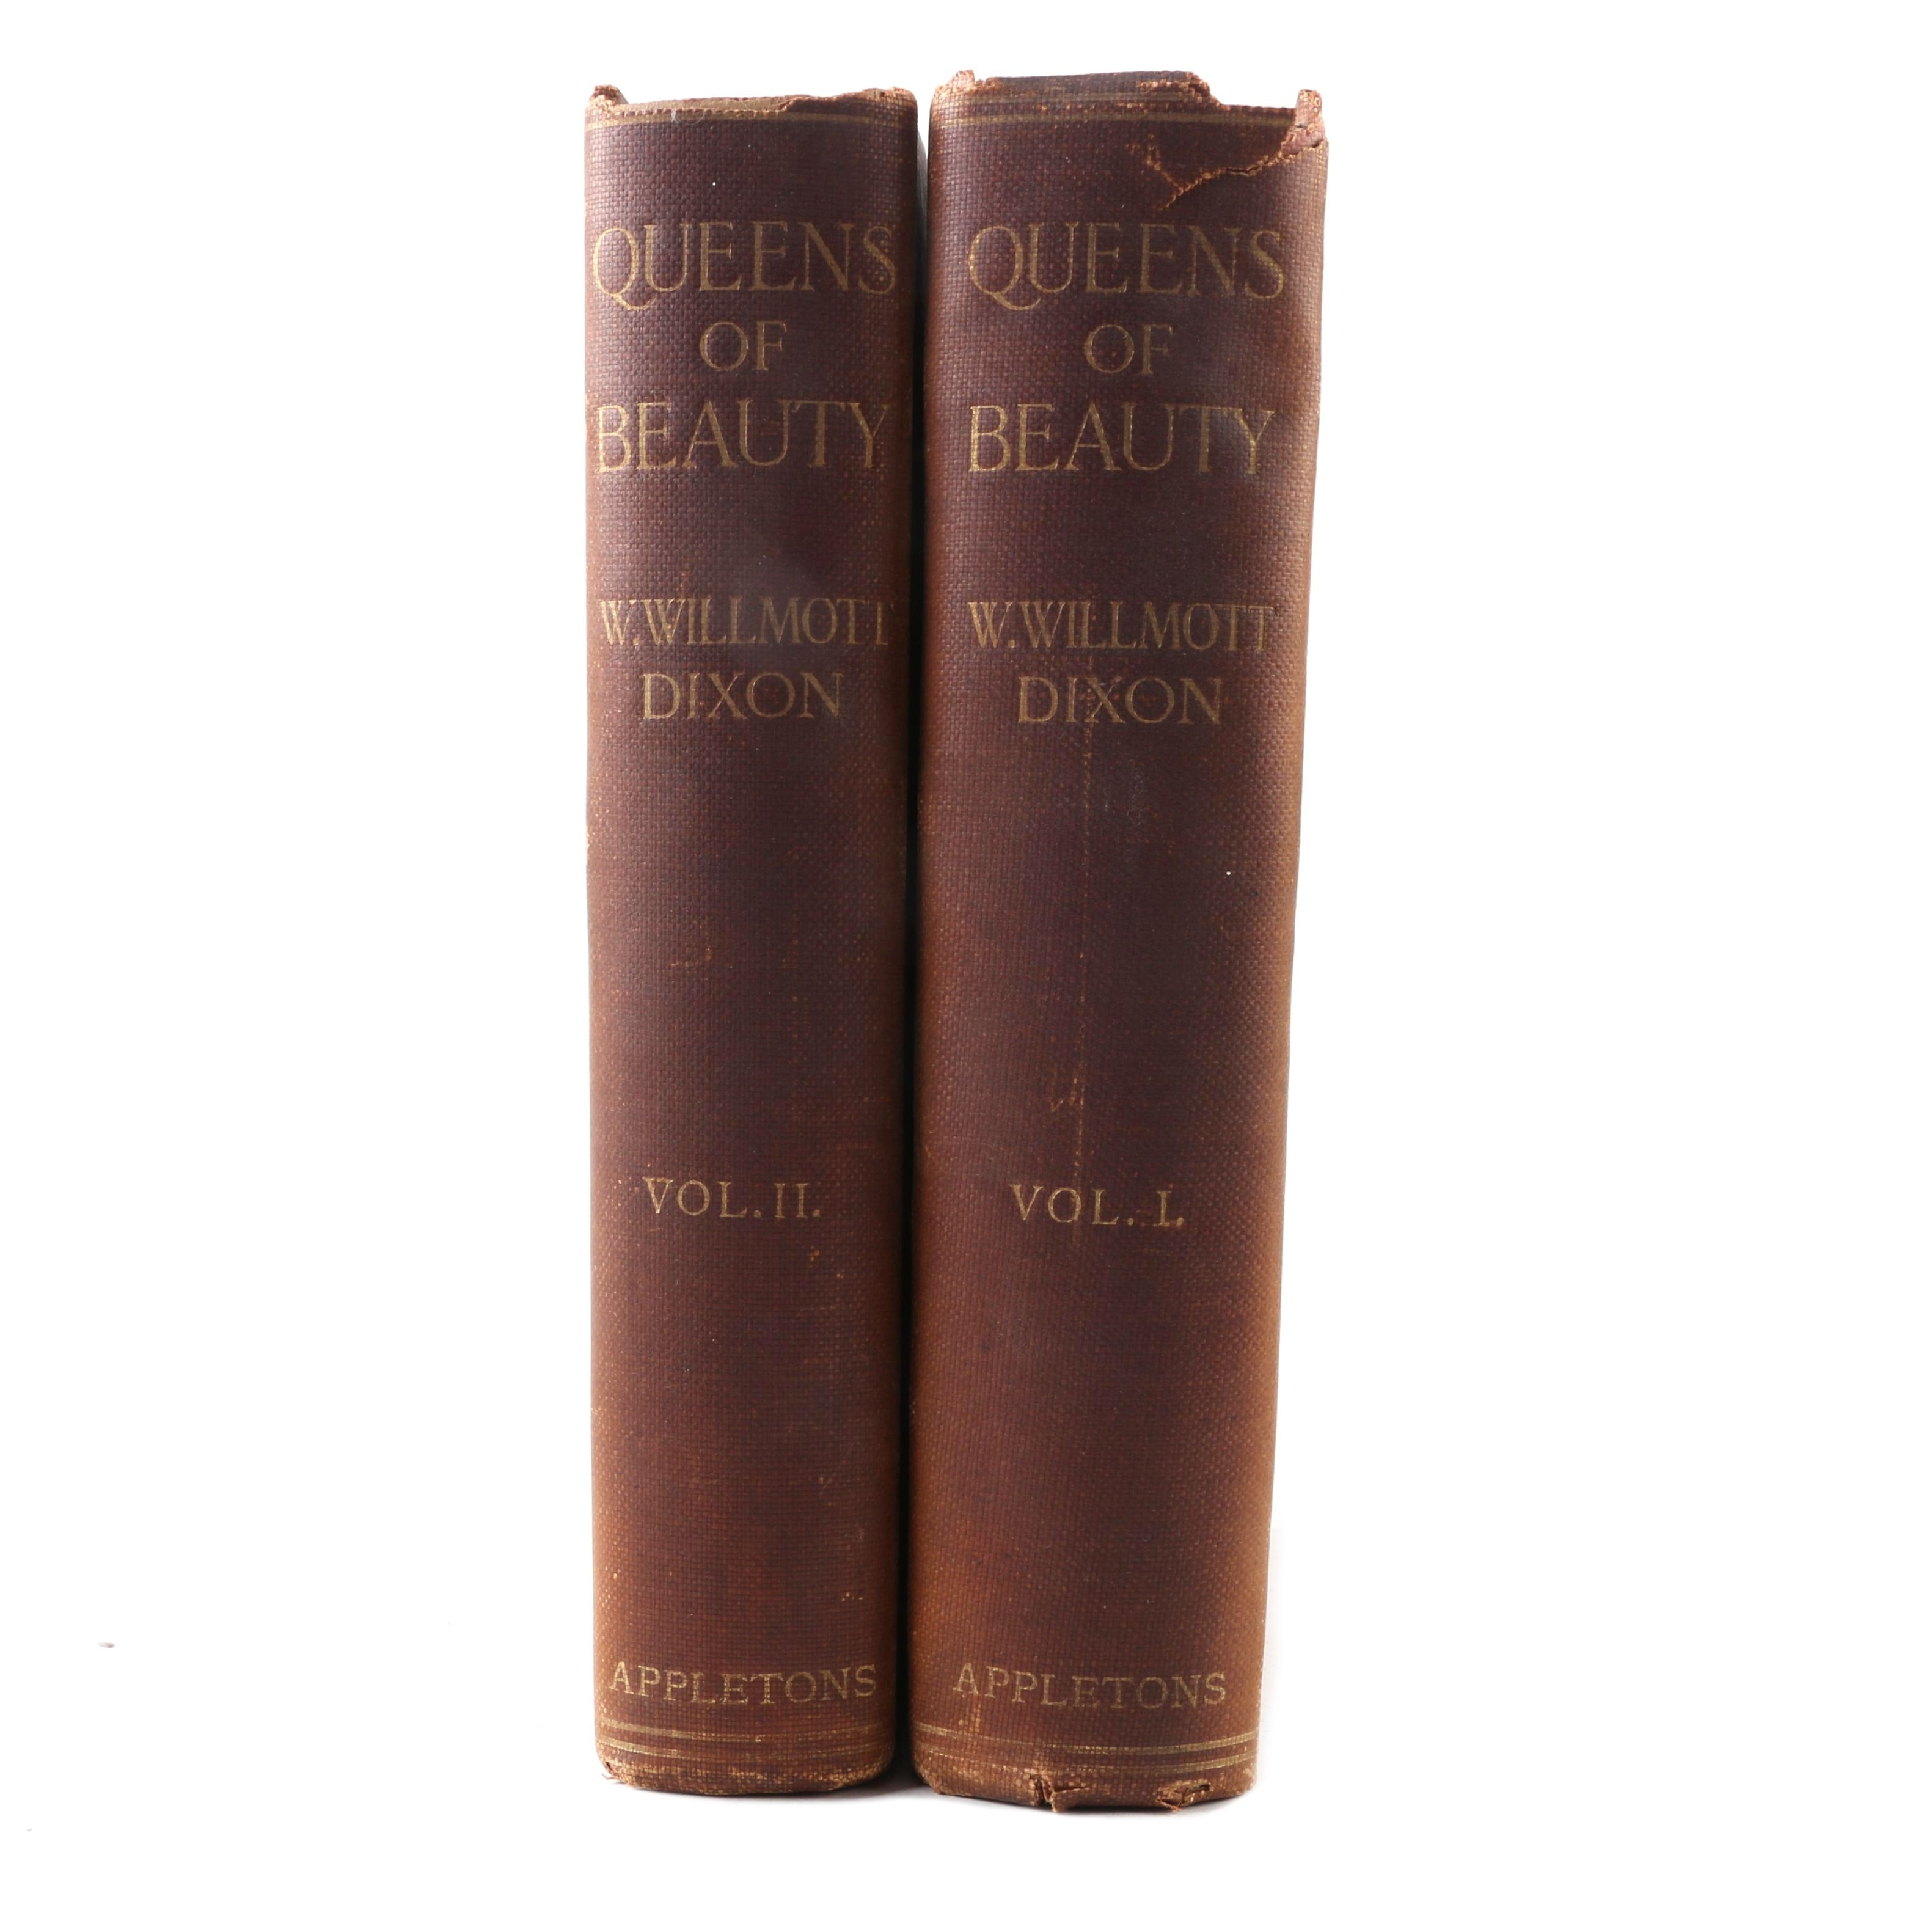 "1907 ""Queens of Beauty"" Two Volume Set by W. Willmott Dixon"